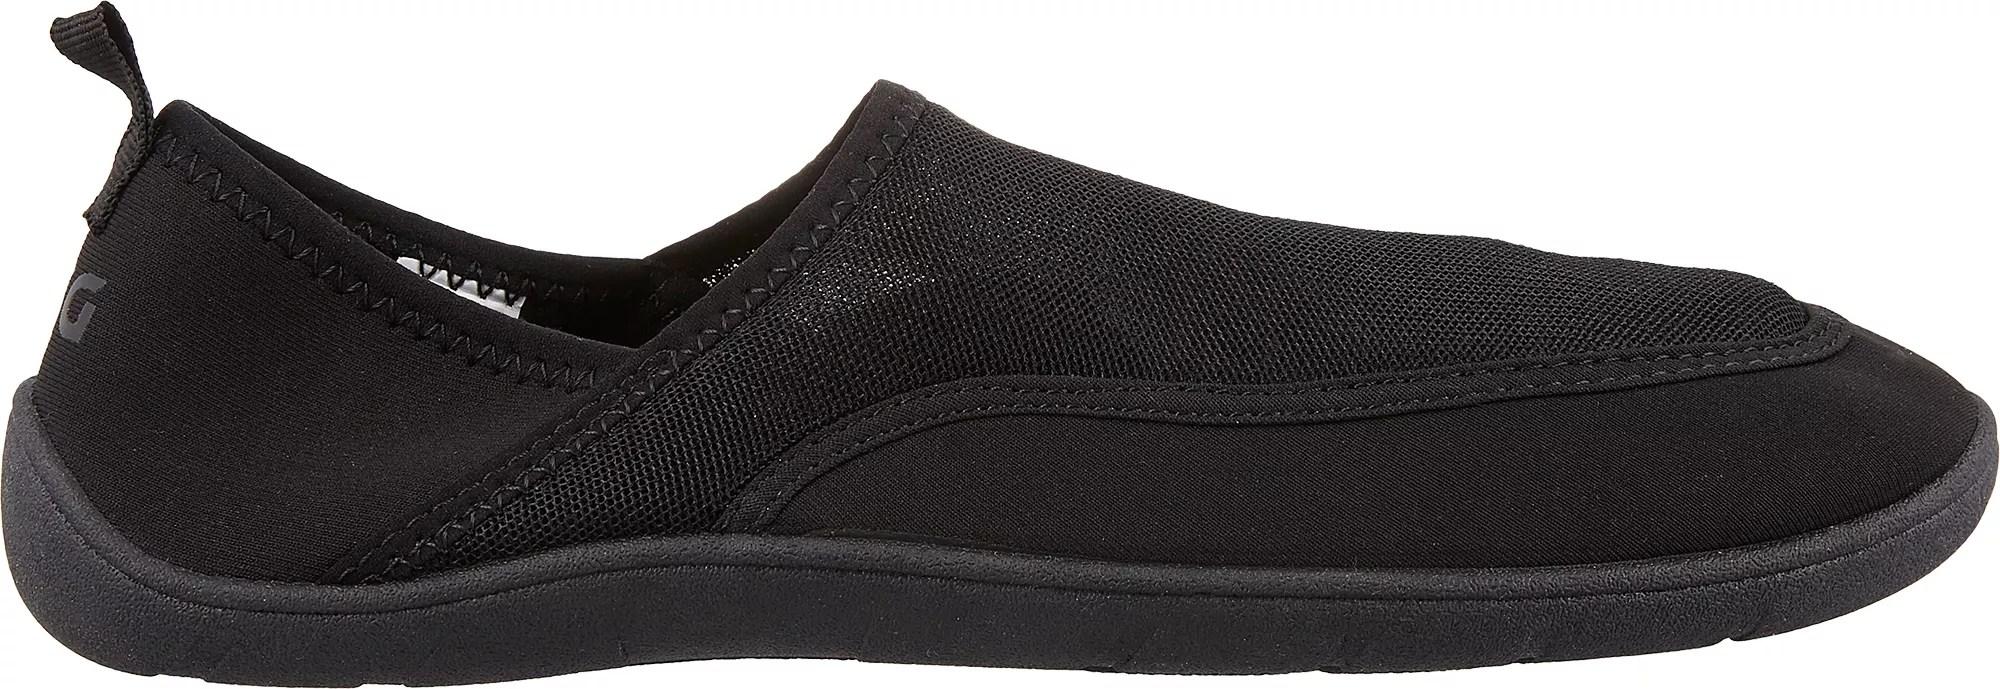 Mens Black Non Slip Shoes Target